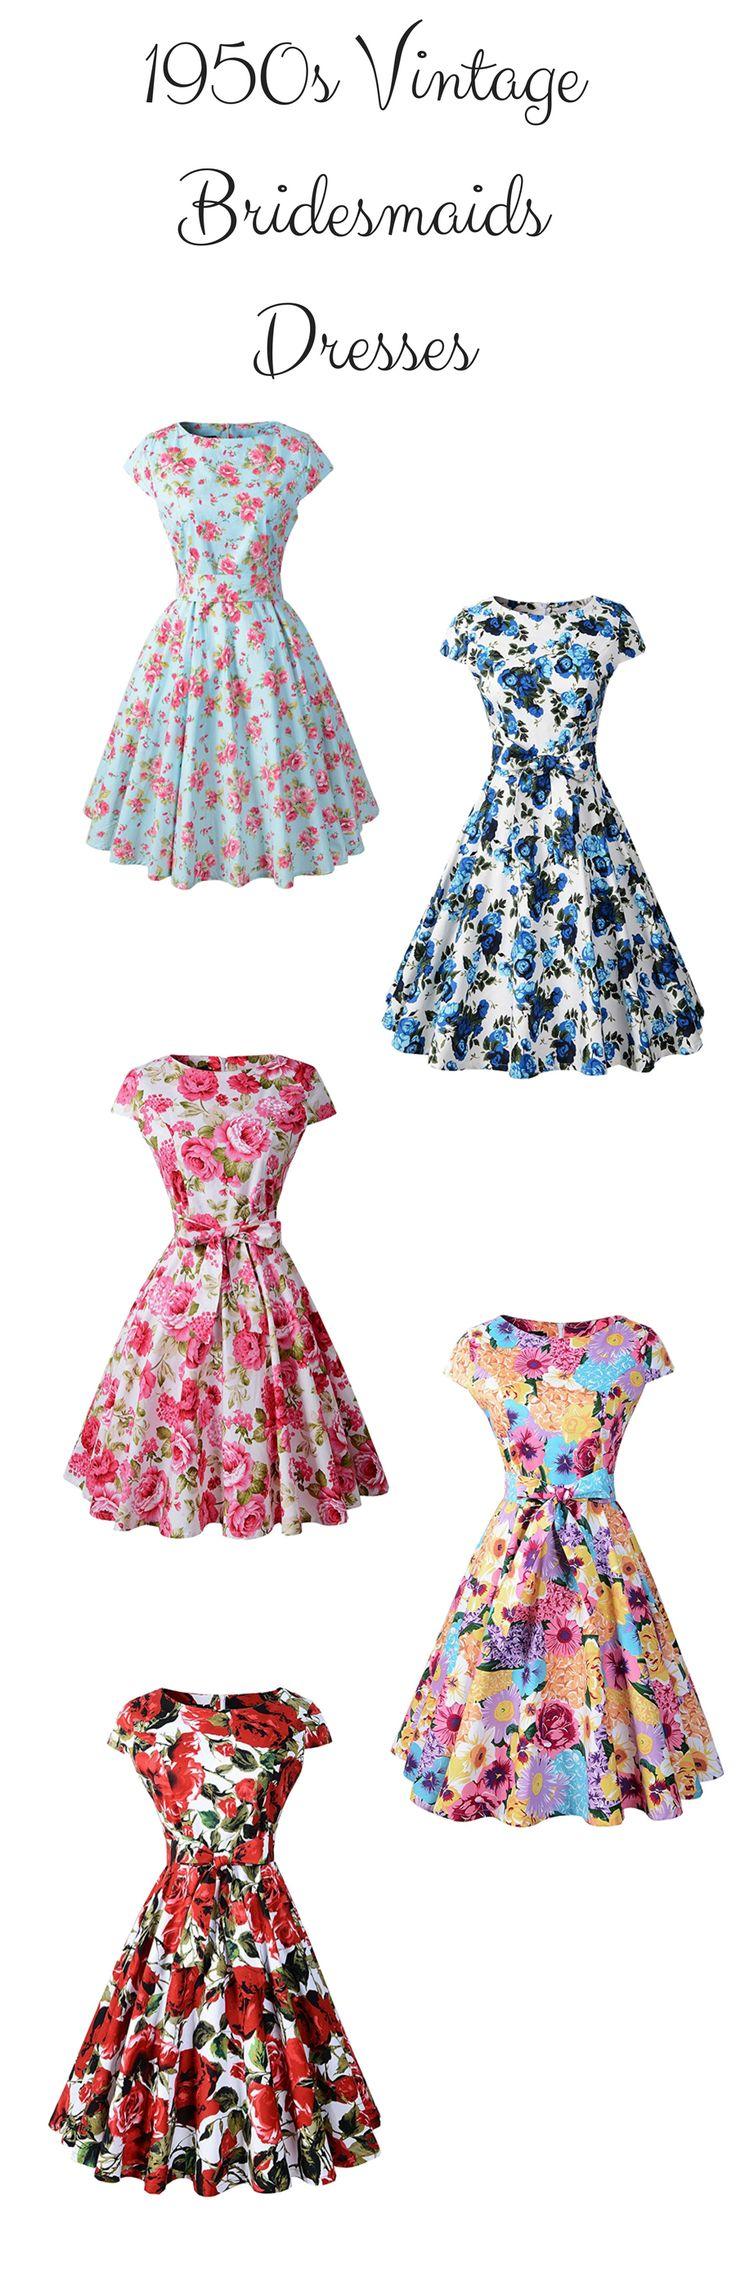 Cute bridesmaids dresses with floral prints - Chicanary Women's 1950s Vintage Cocktail Party Swing Dress Cap-sleeve - https://www.amazon.com/dp/B072BW83FD/ref=as_li_ss_tl?ie=UTF8&linkCode=ll1&tag=theweddingclu-20&linkId=9bb1e61acf7ae605b461b38b5f859d2b